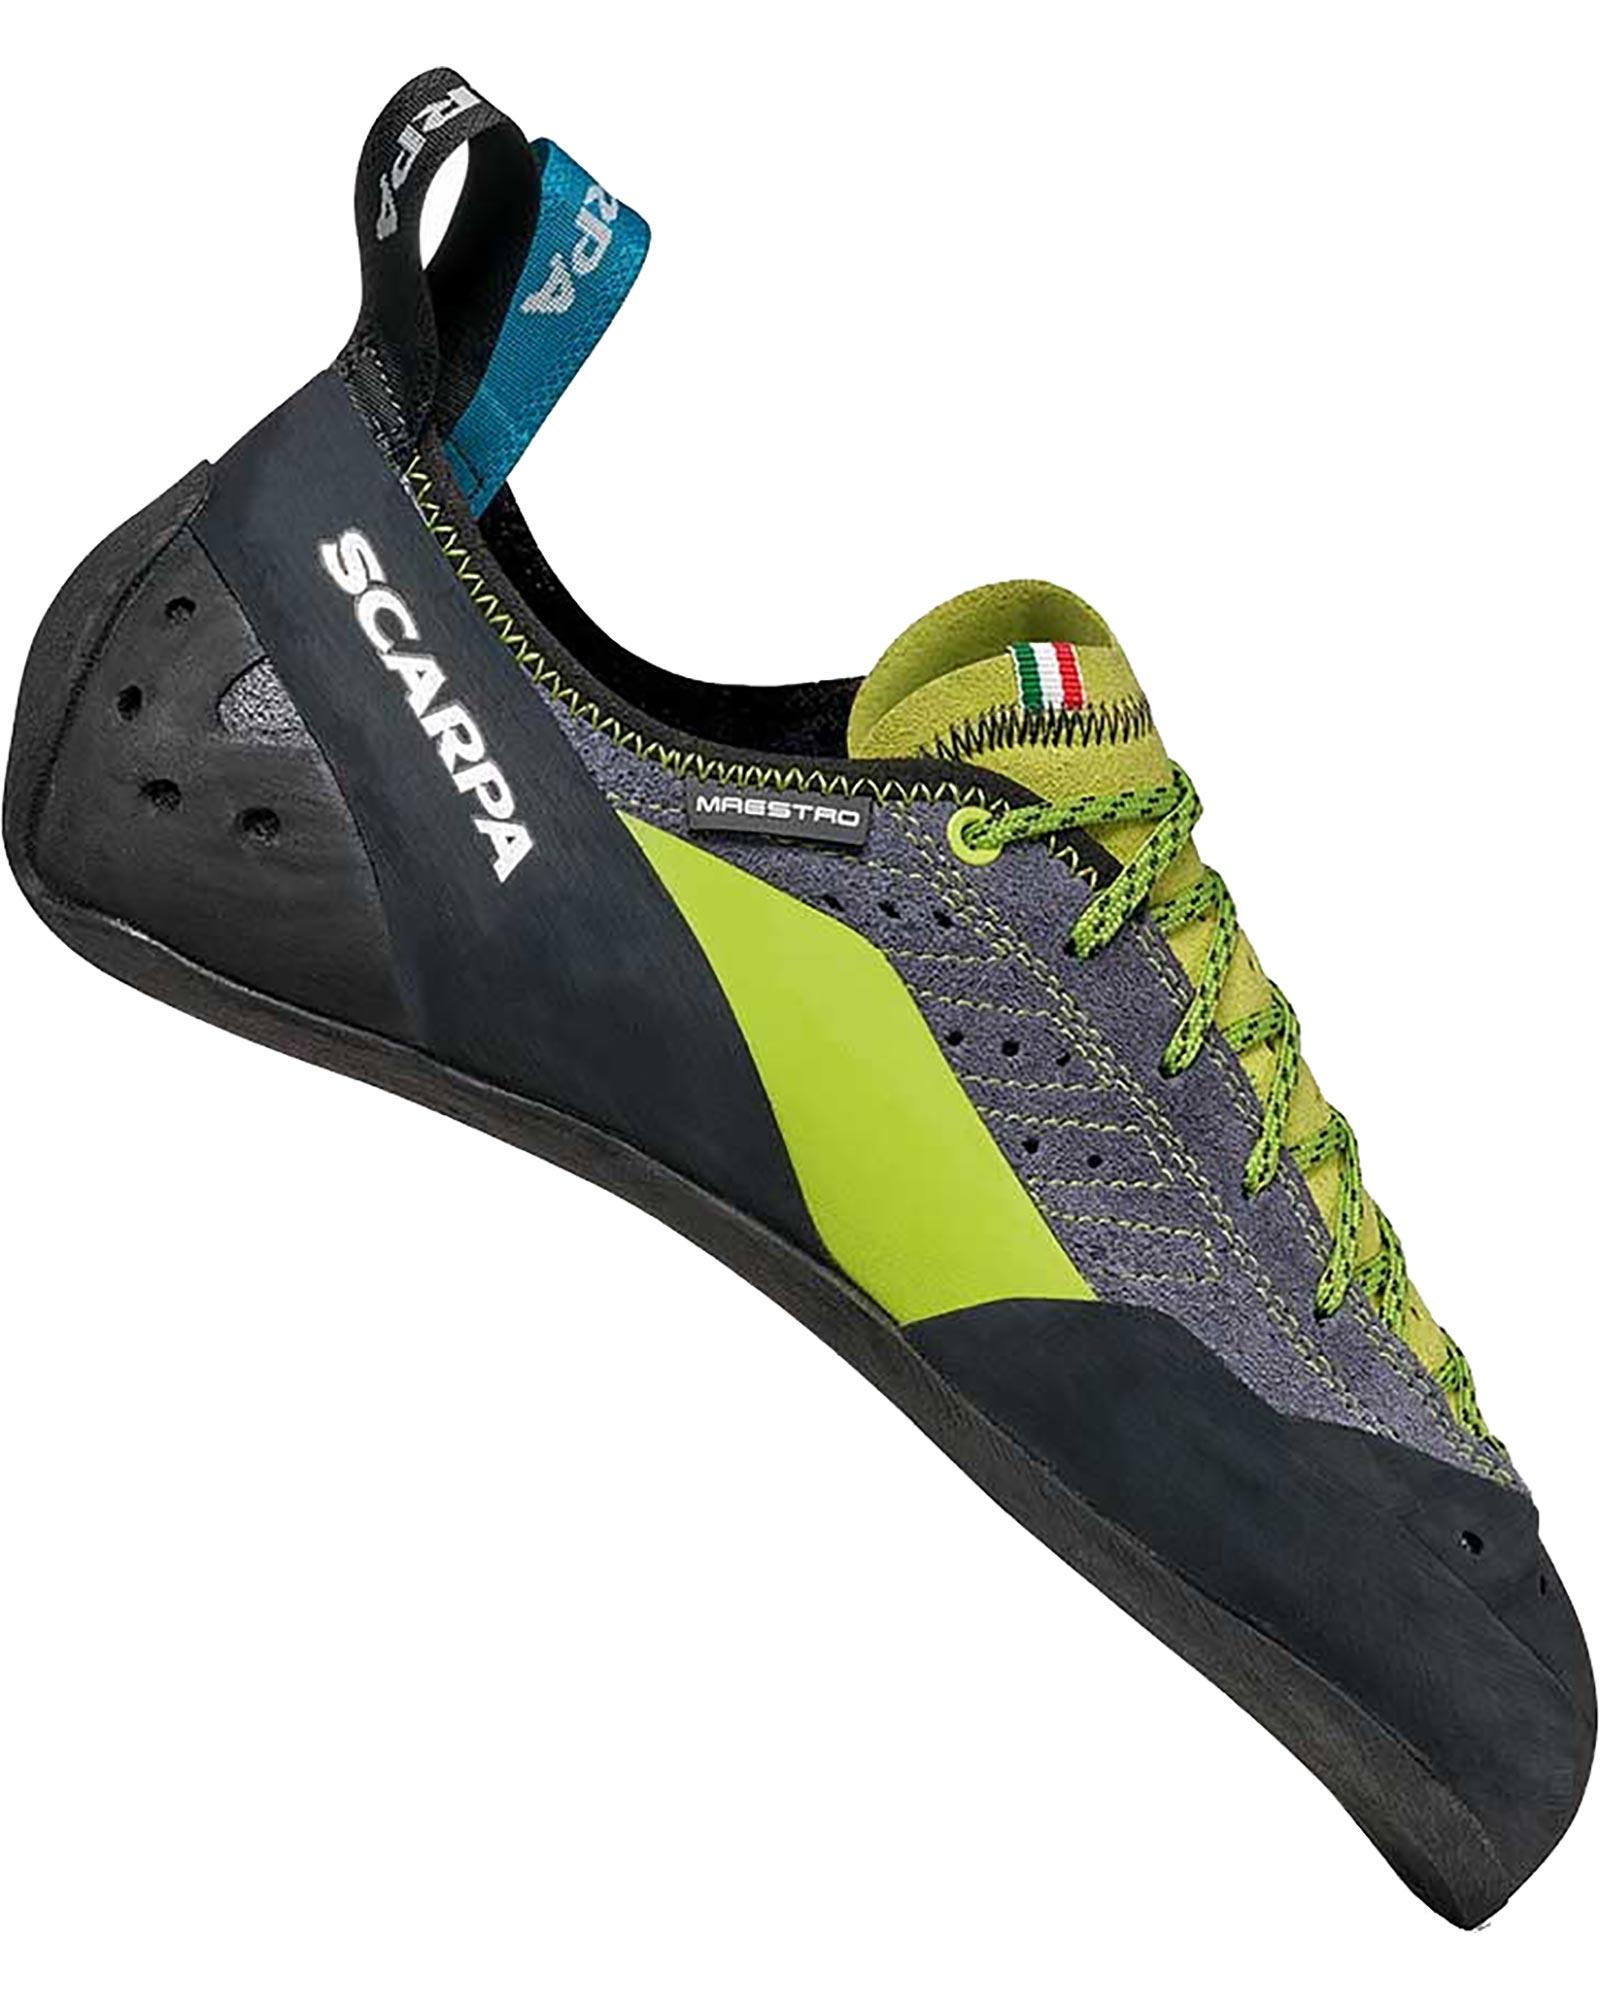 Scarpa Men's Maestro Climbing Shoes 0